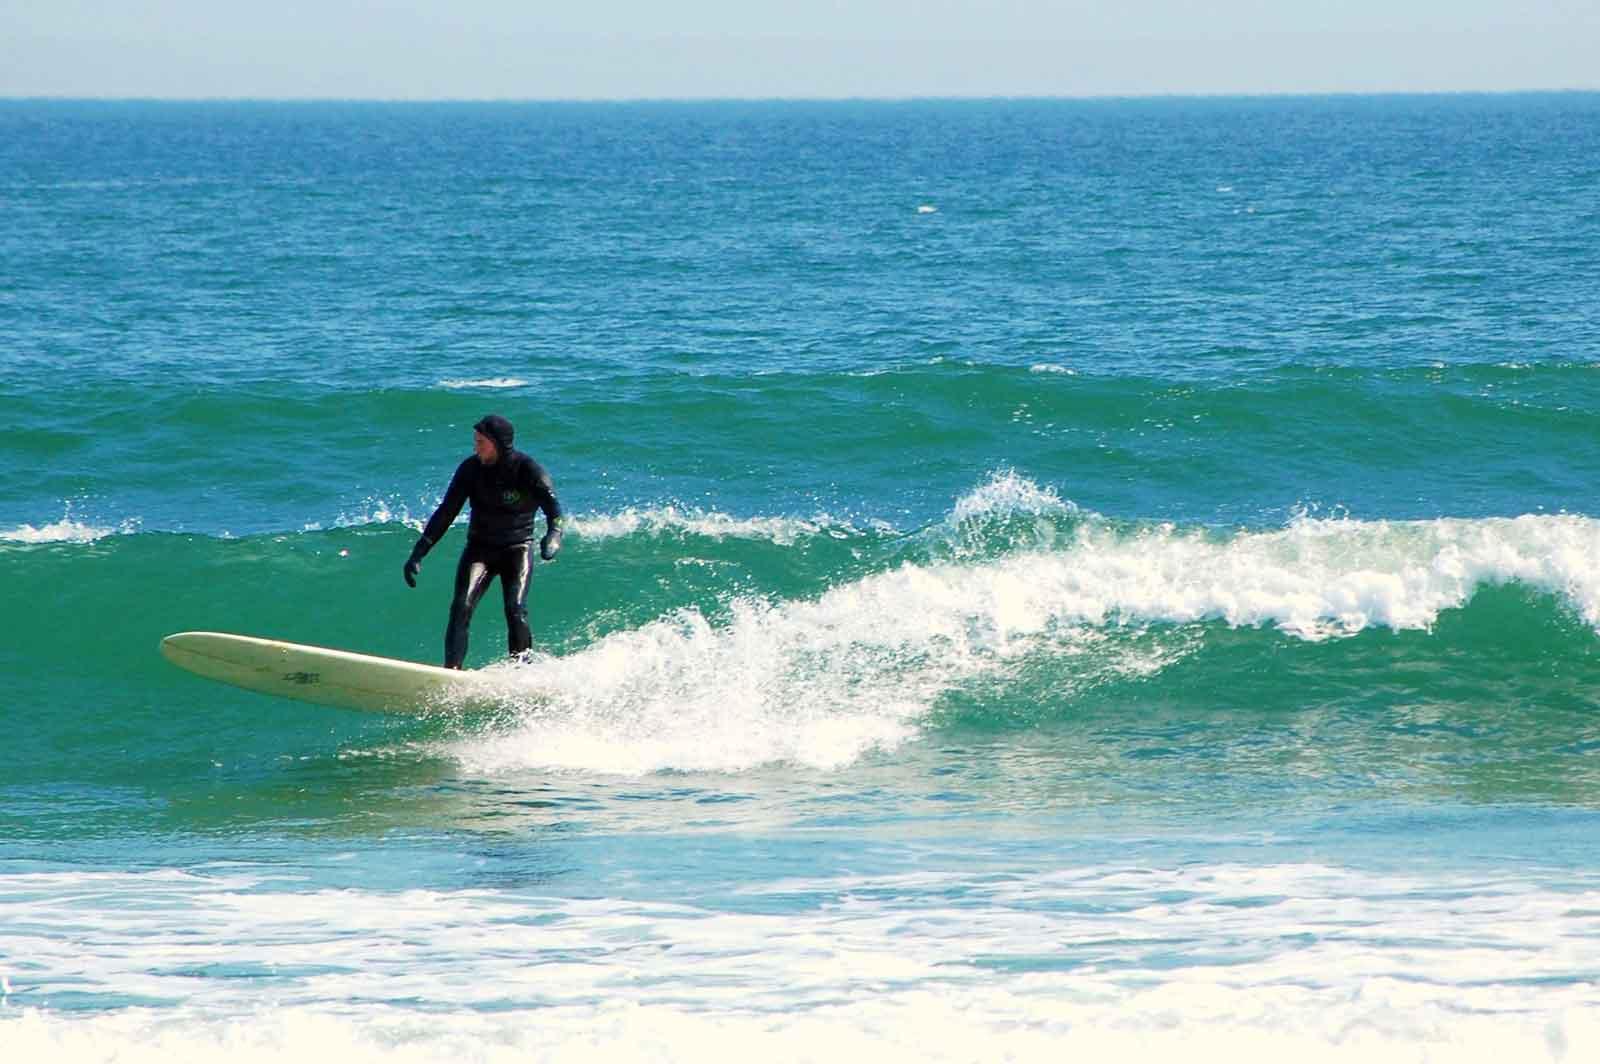 25 Useful Tips for Beginner Surfers